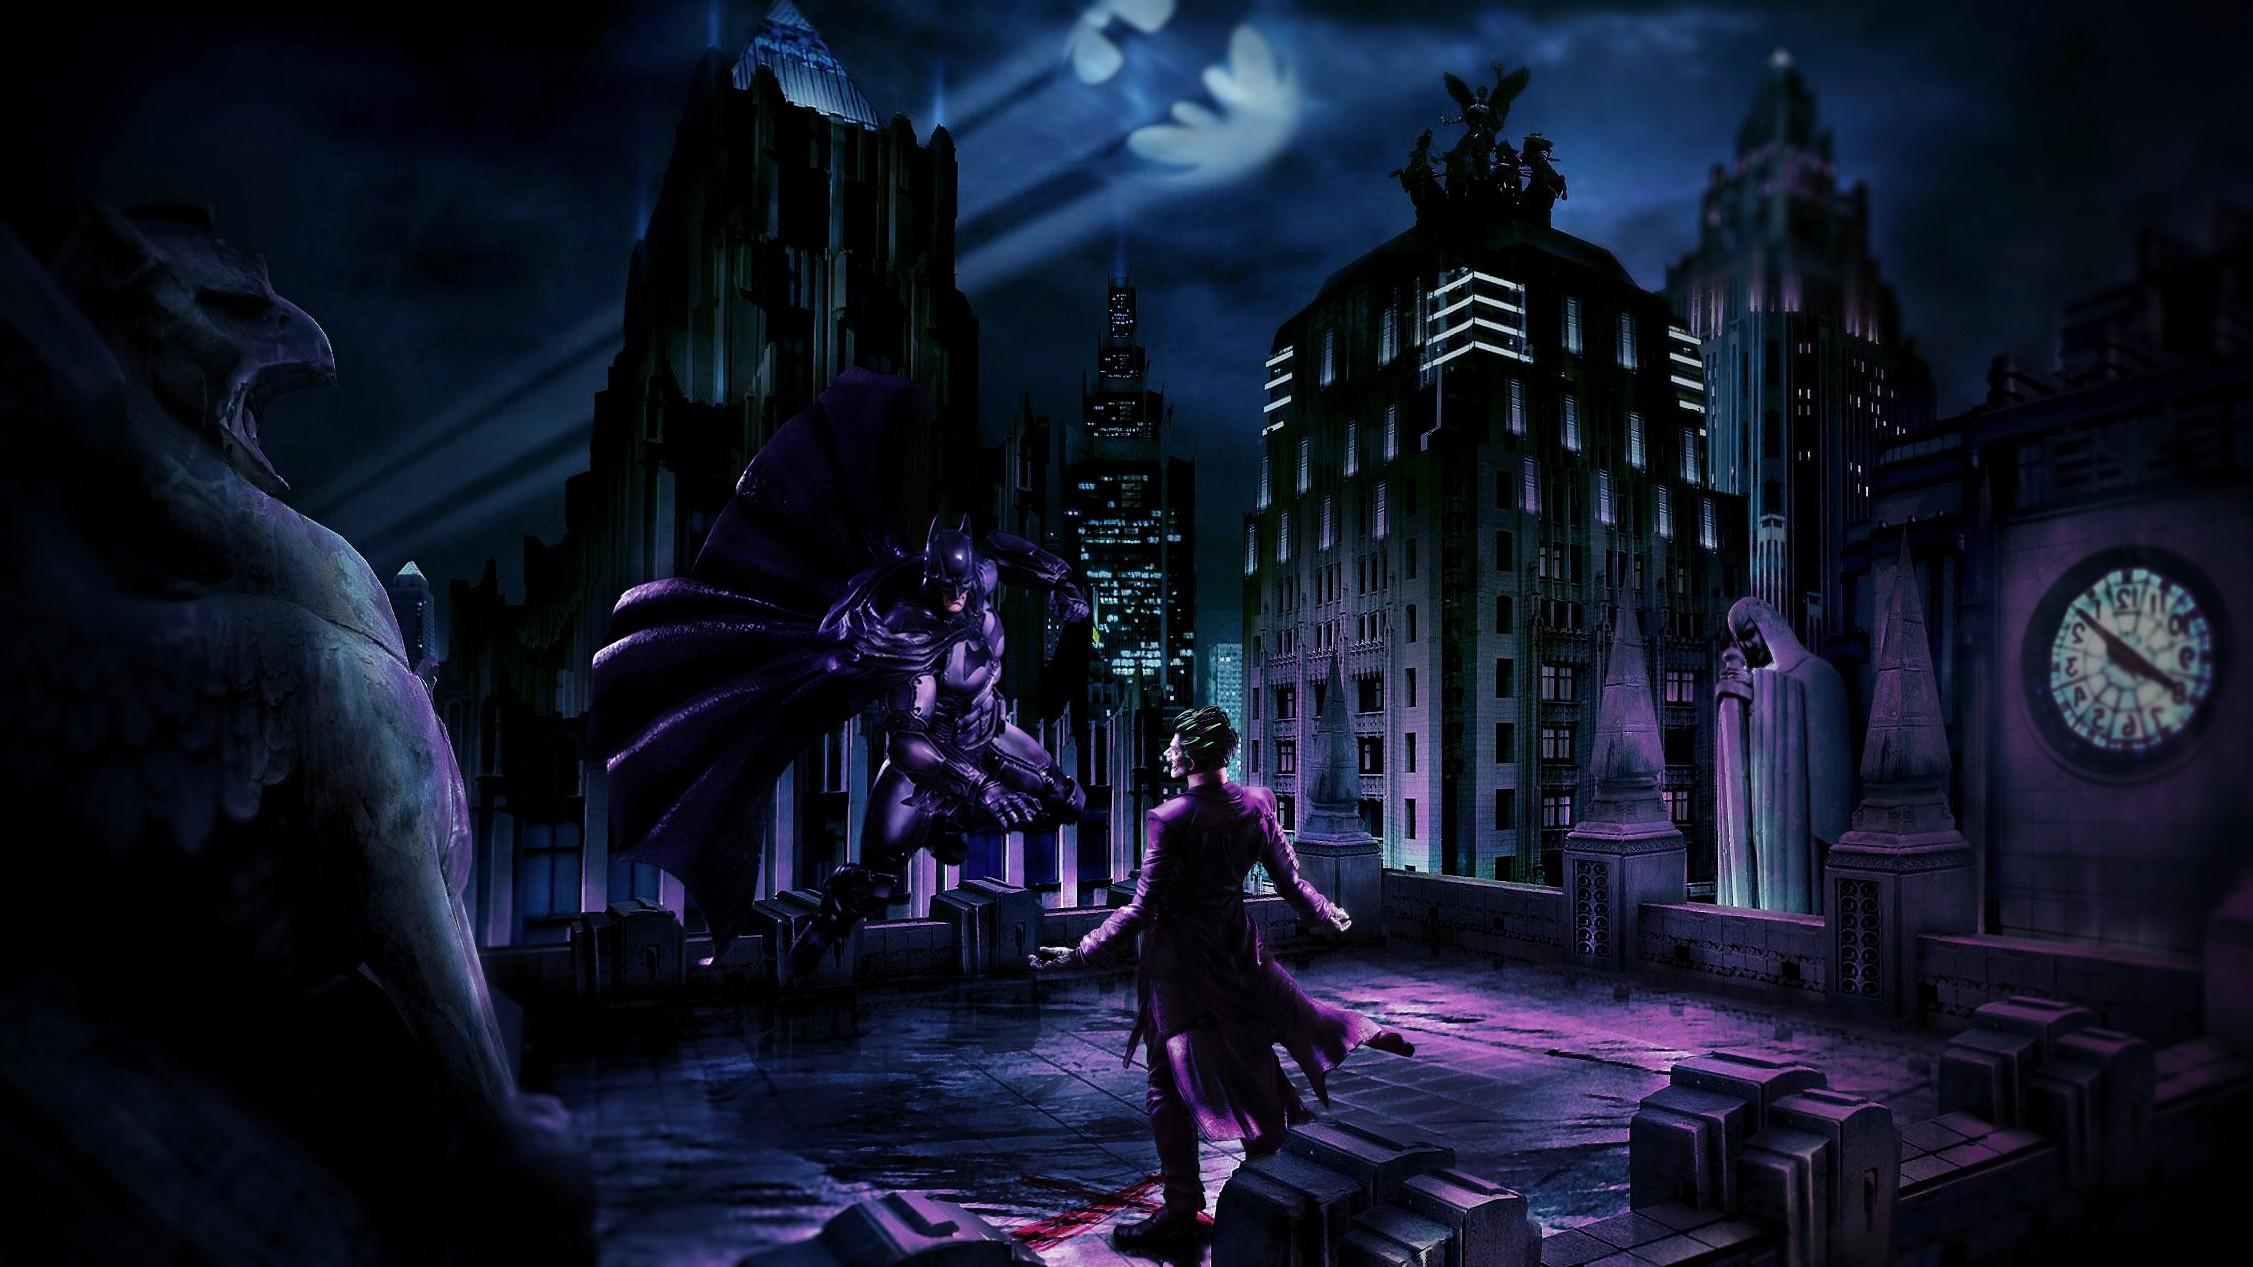 2253x1267 Px Adobe Photoshop Batman Comic Art Joker